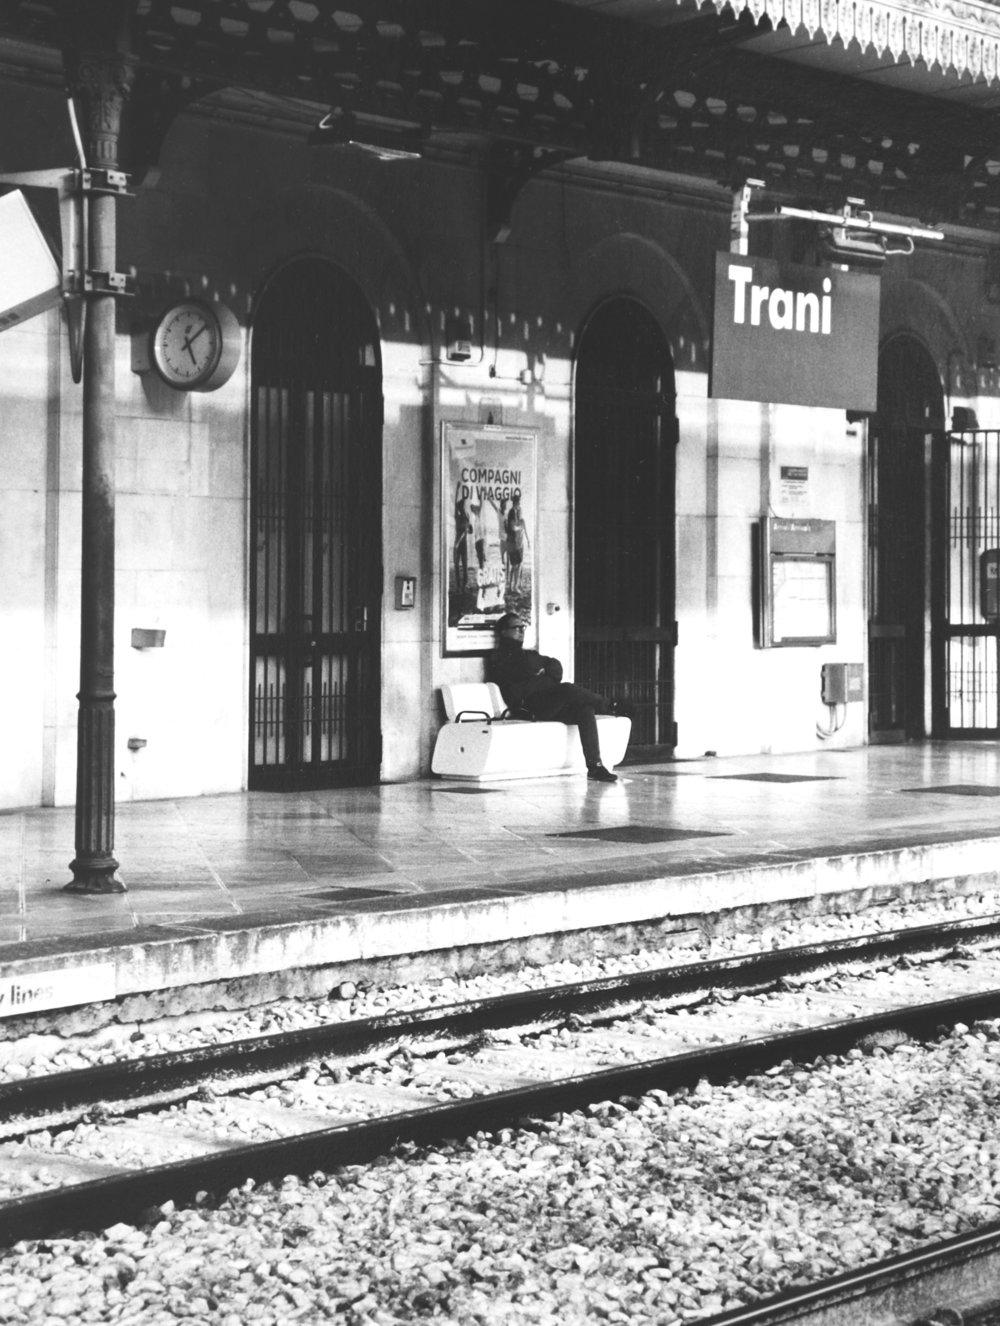 Trani trains, Italy